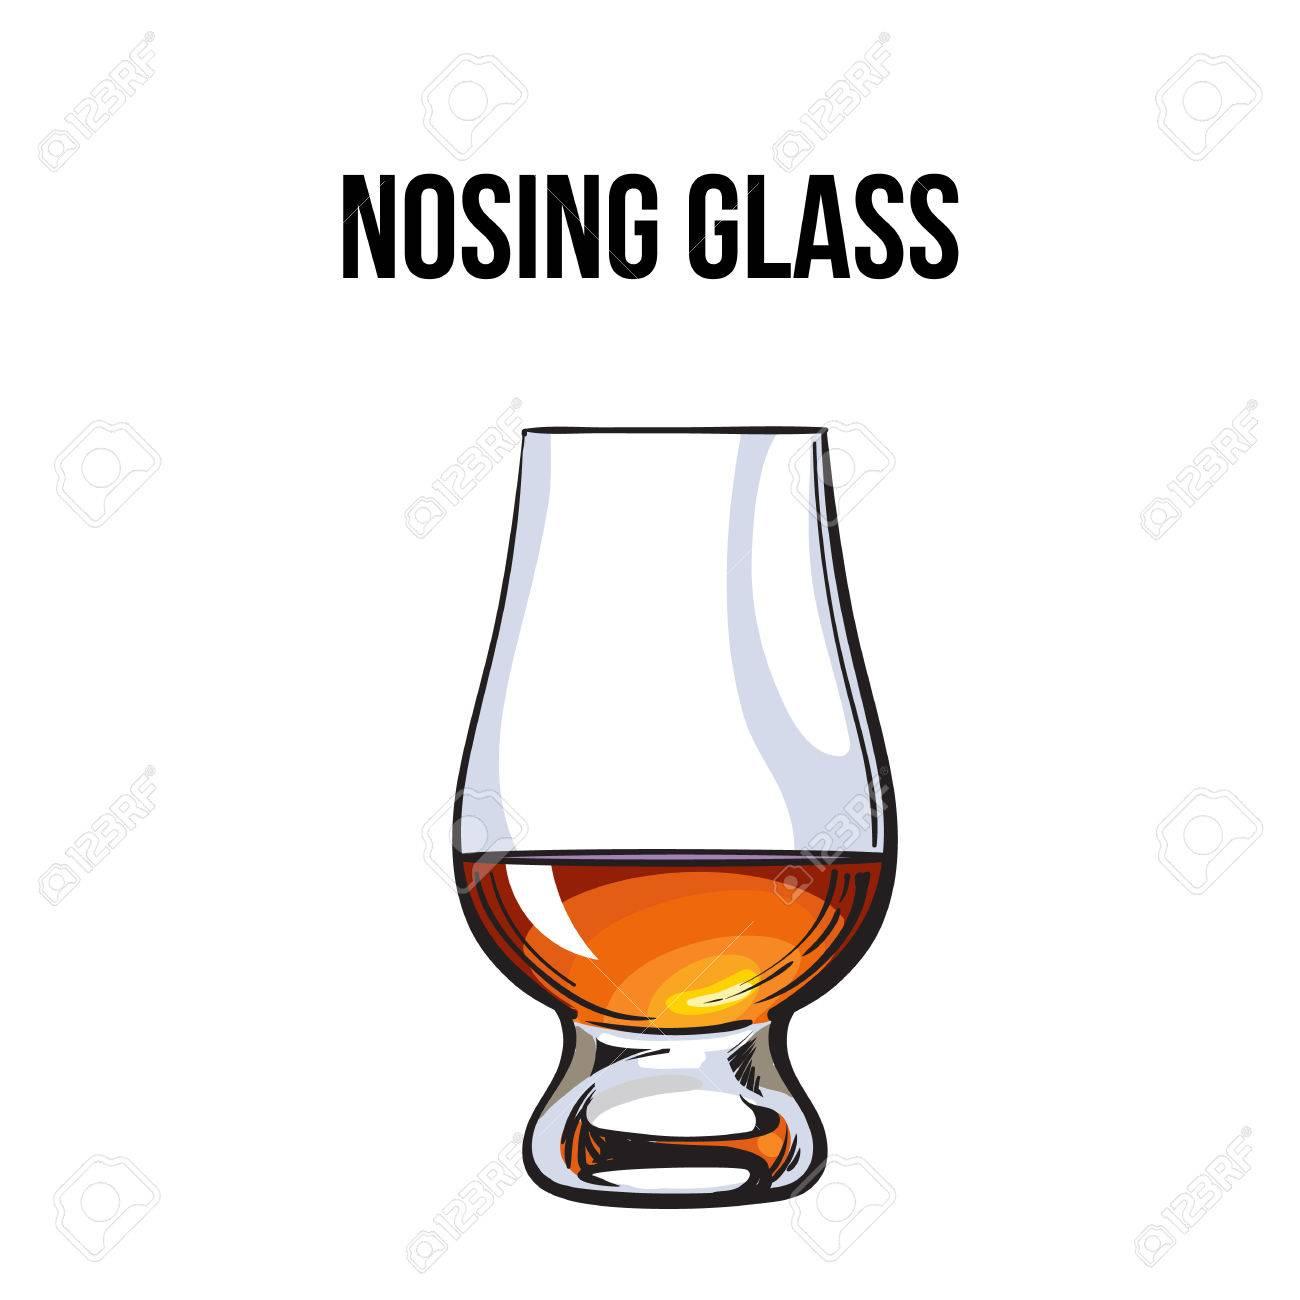 Scotch Whisky Rhum Brandy Nosing Verre Croquis Style Vecteur